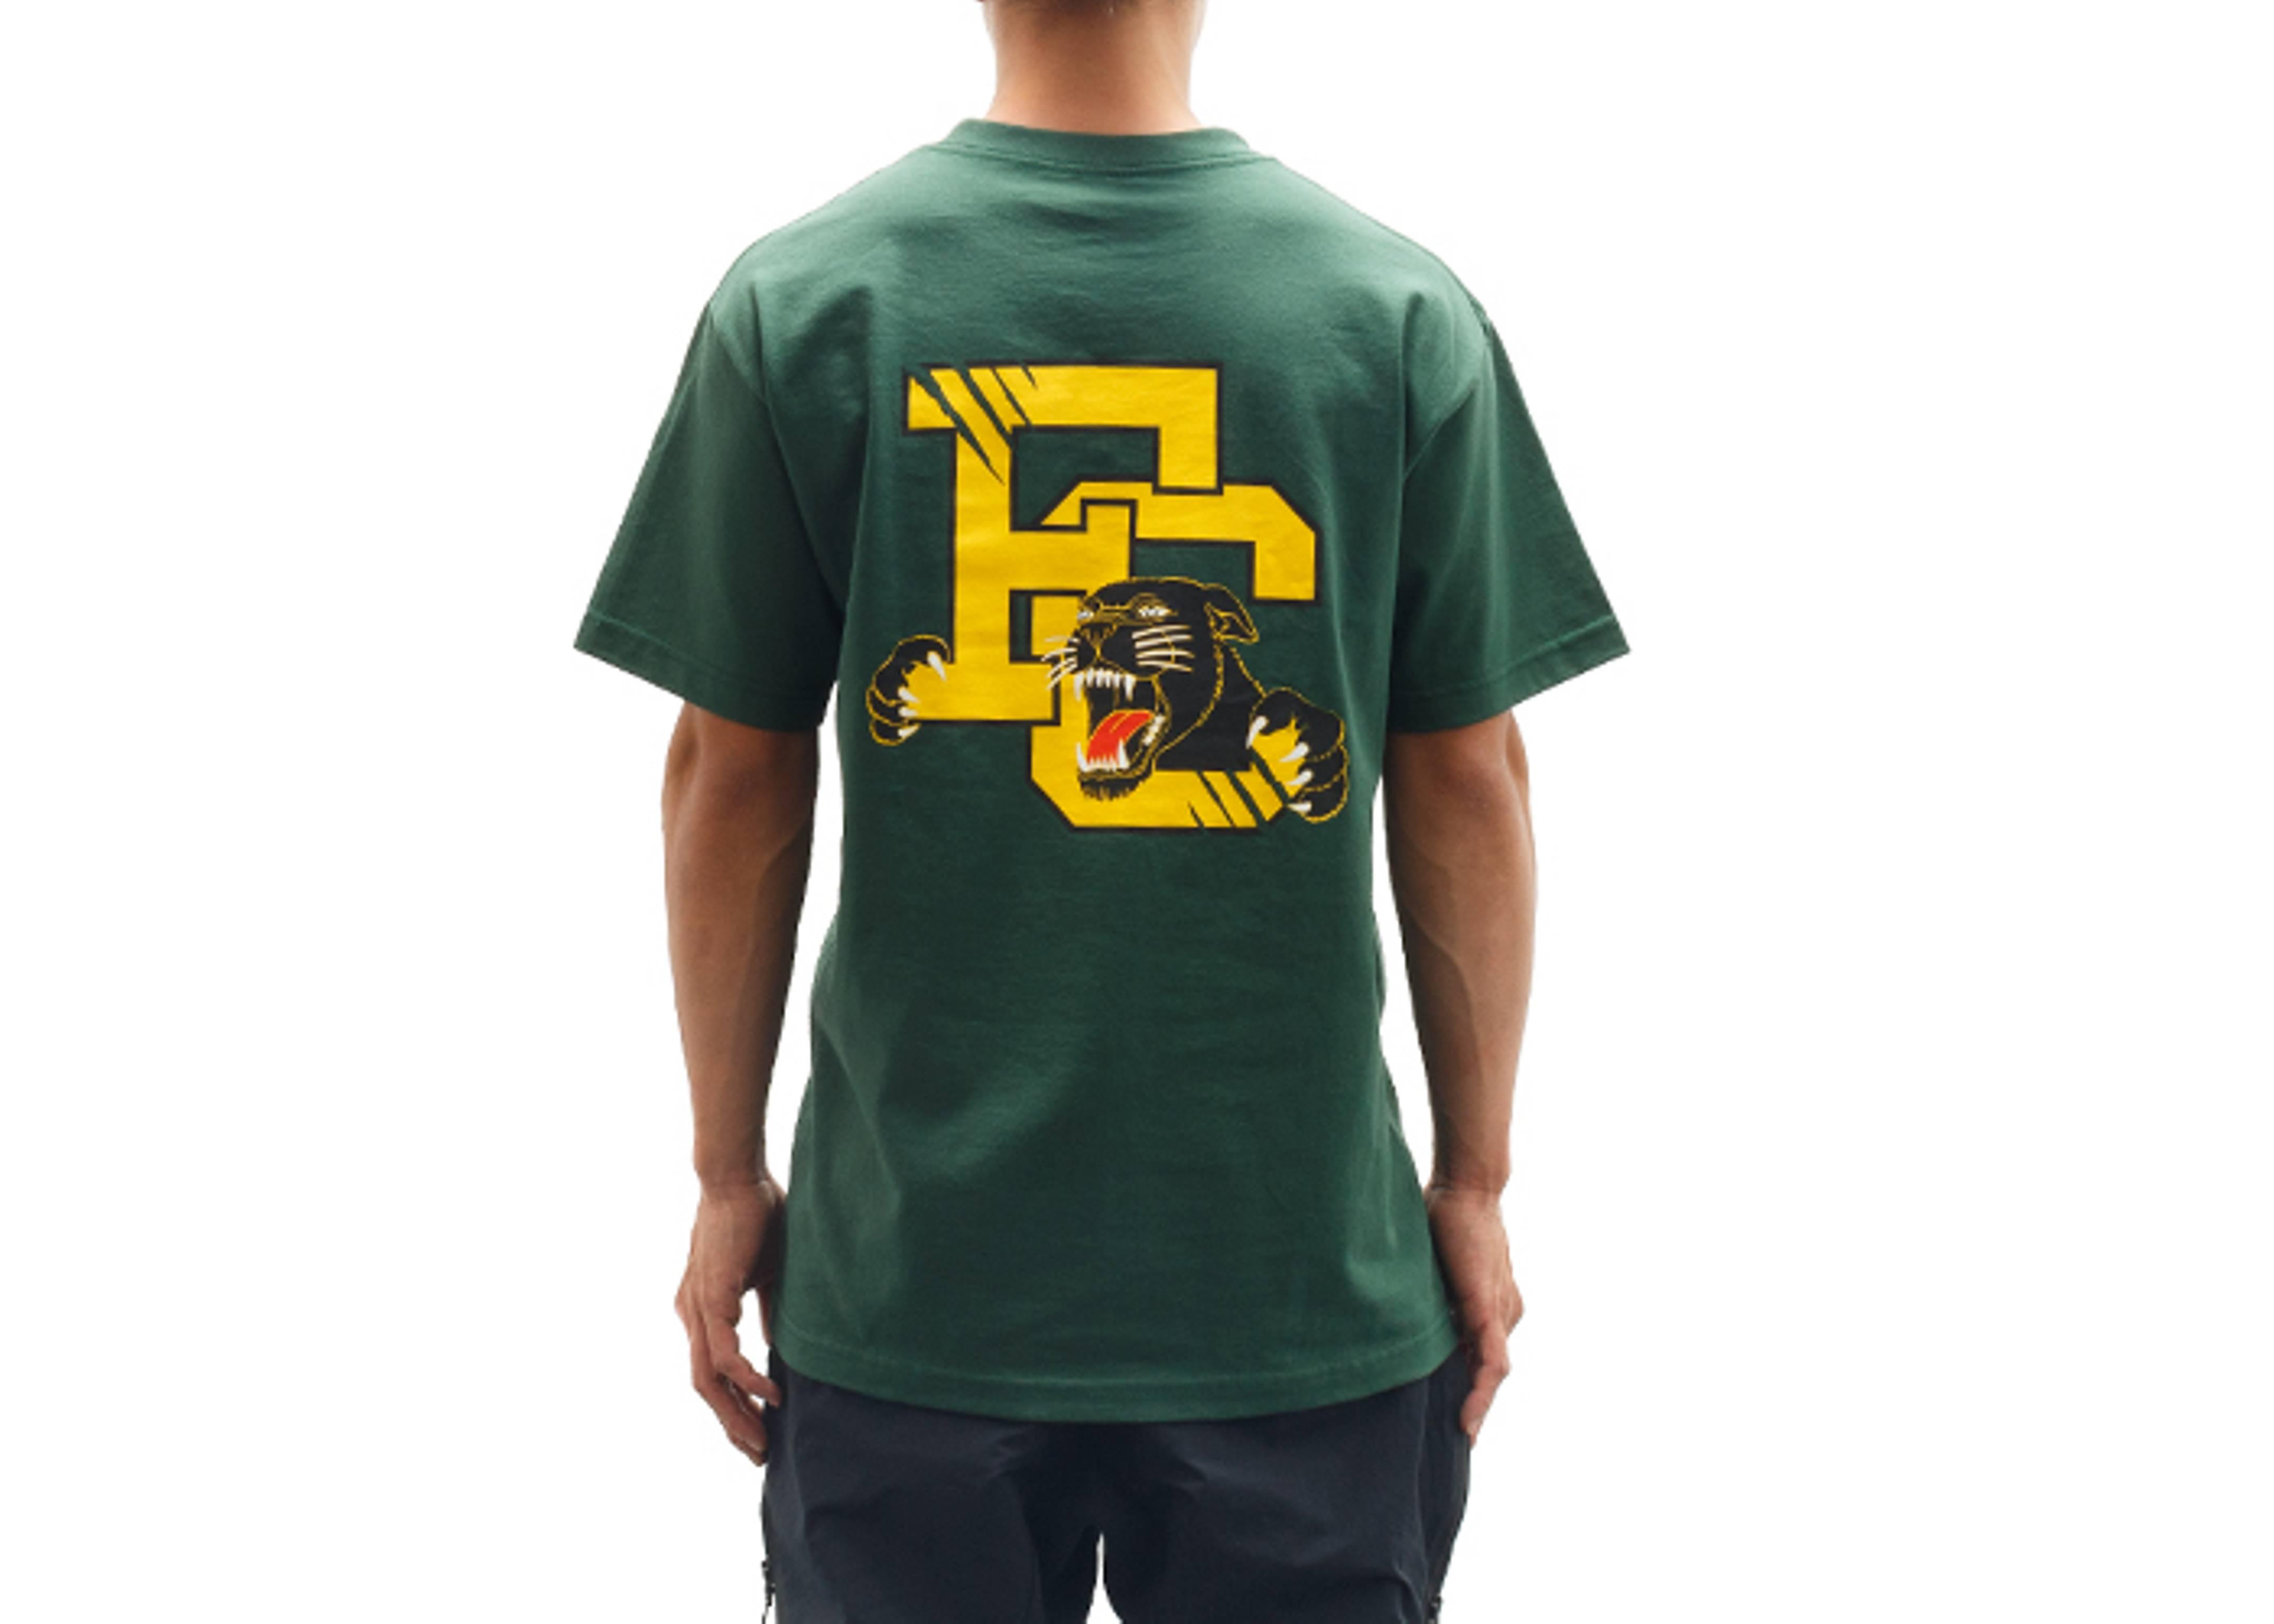 fcu t-shirt